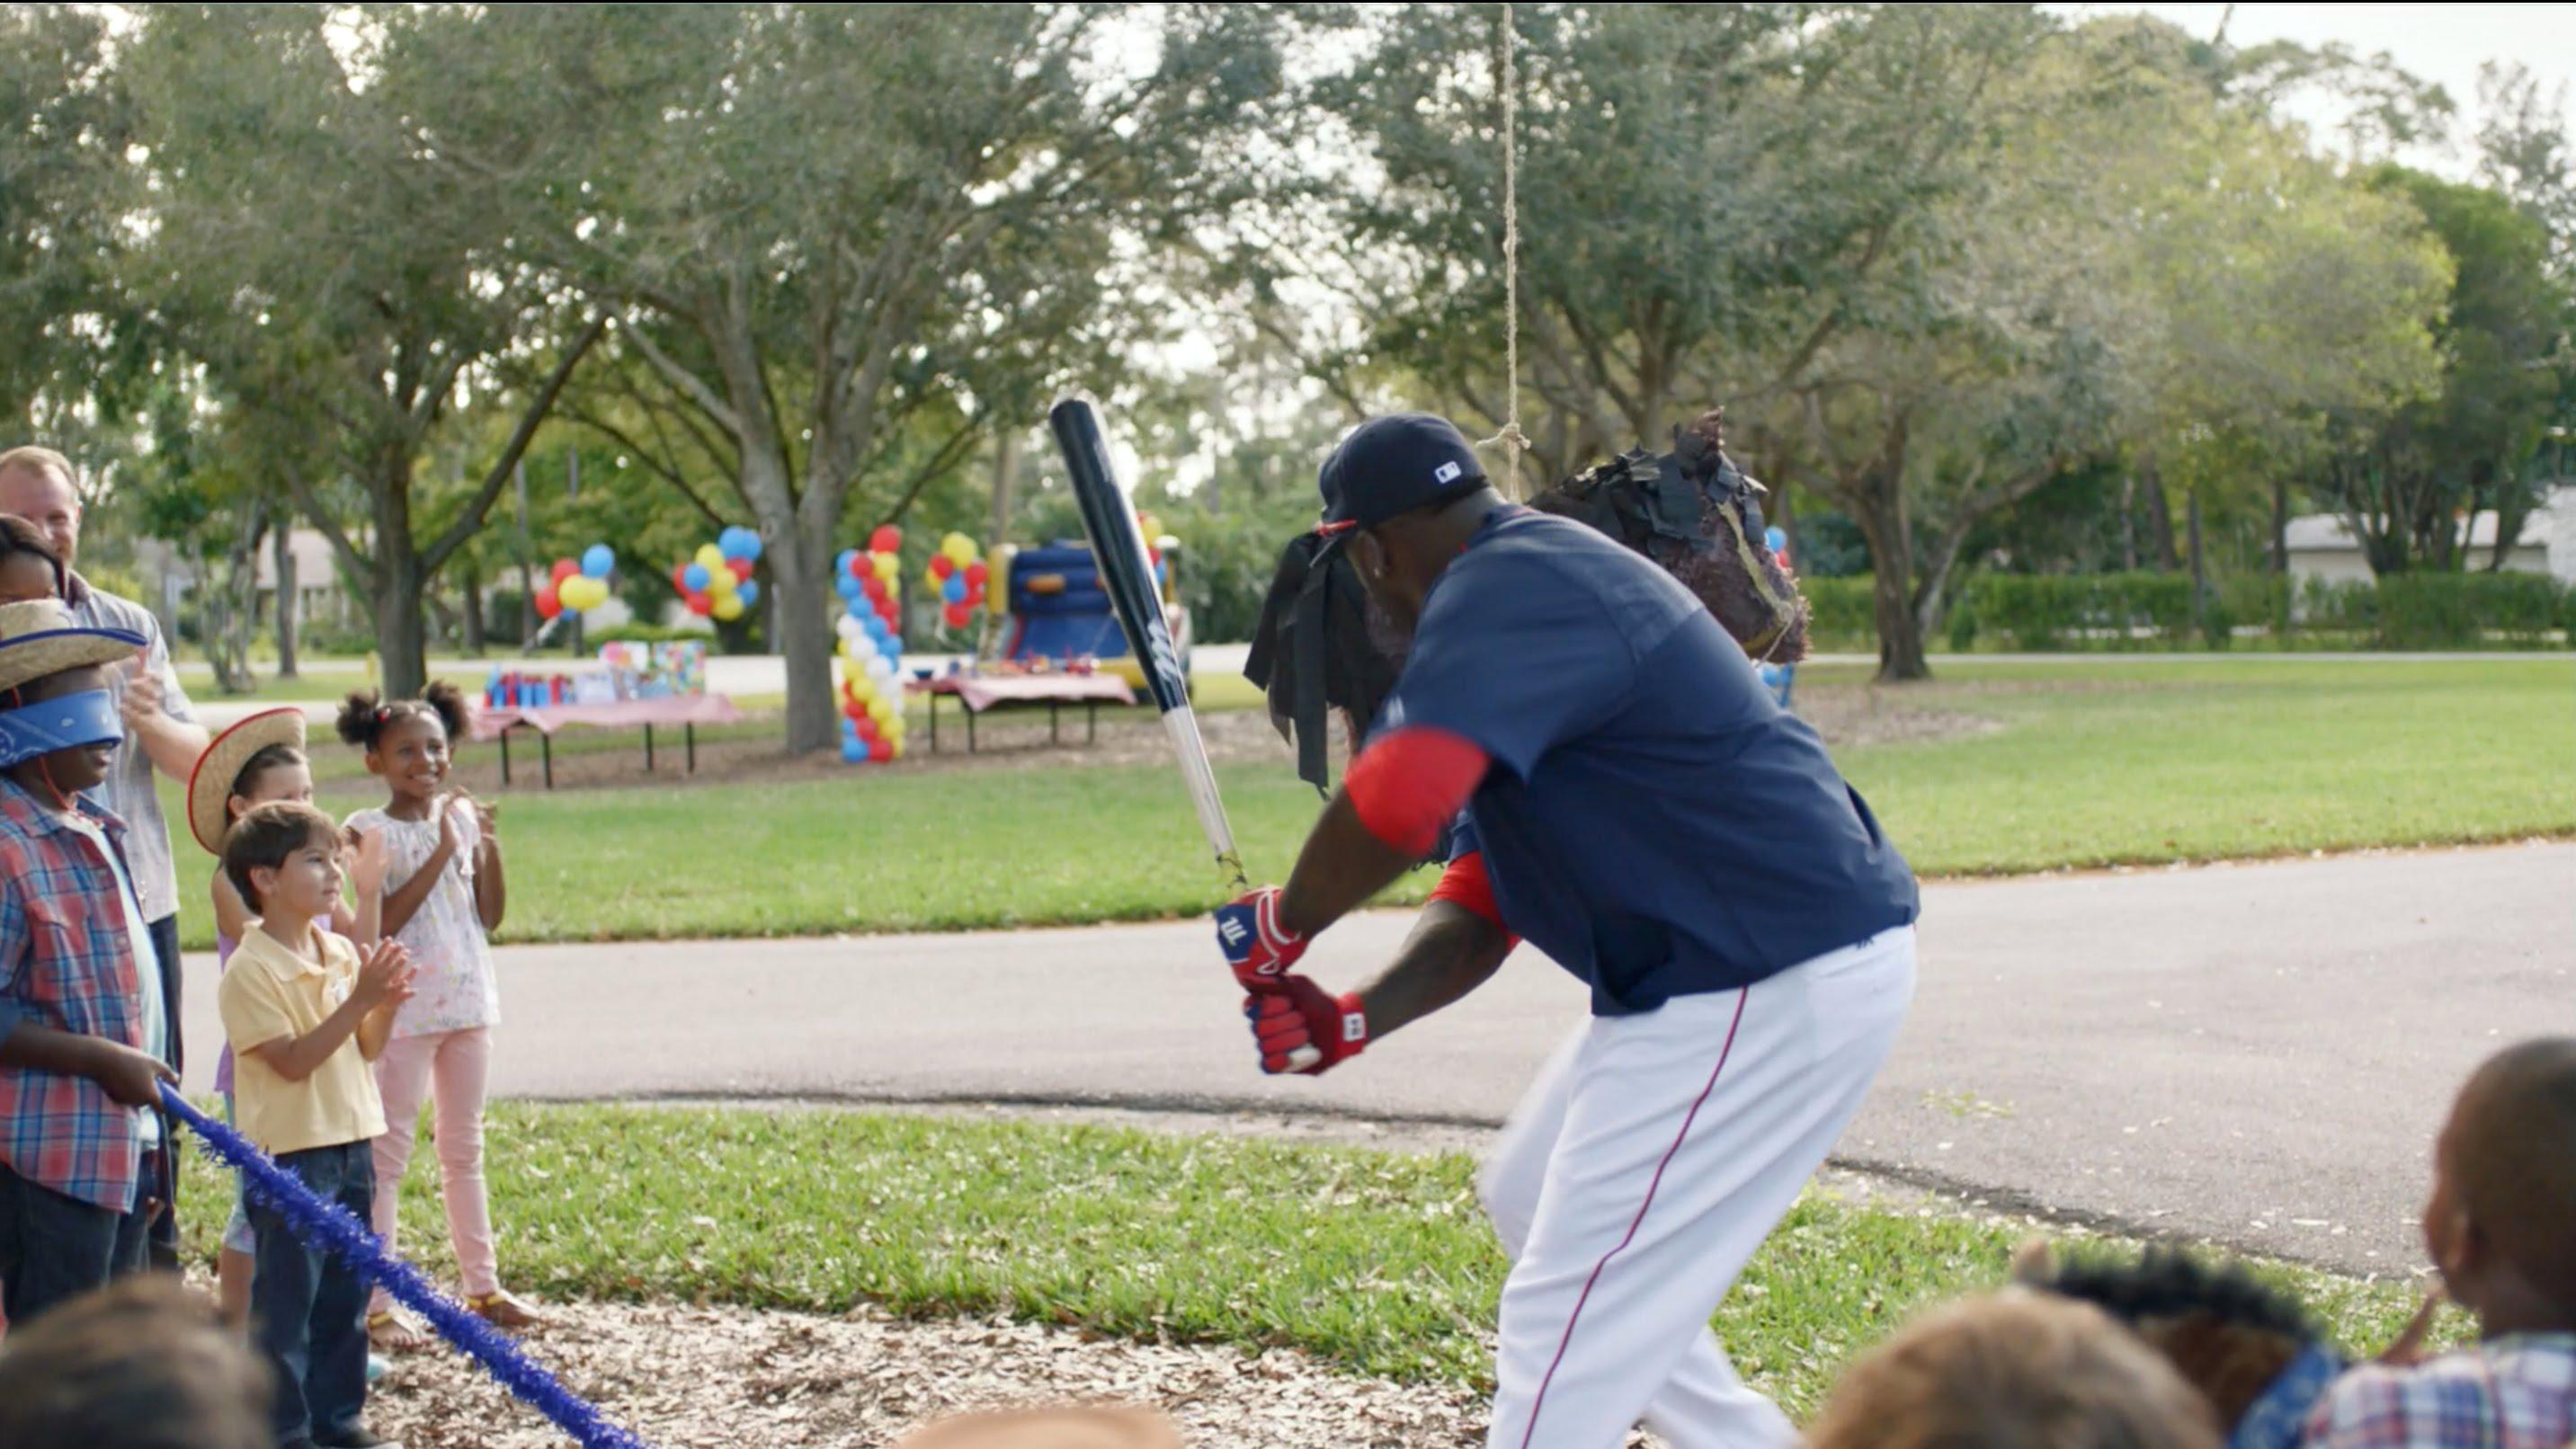 David Ortiz is the Piñata slayer